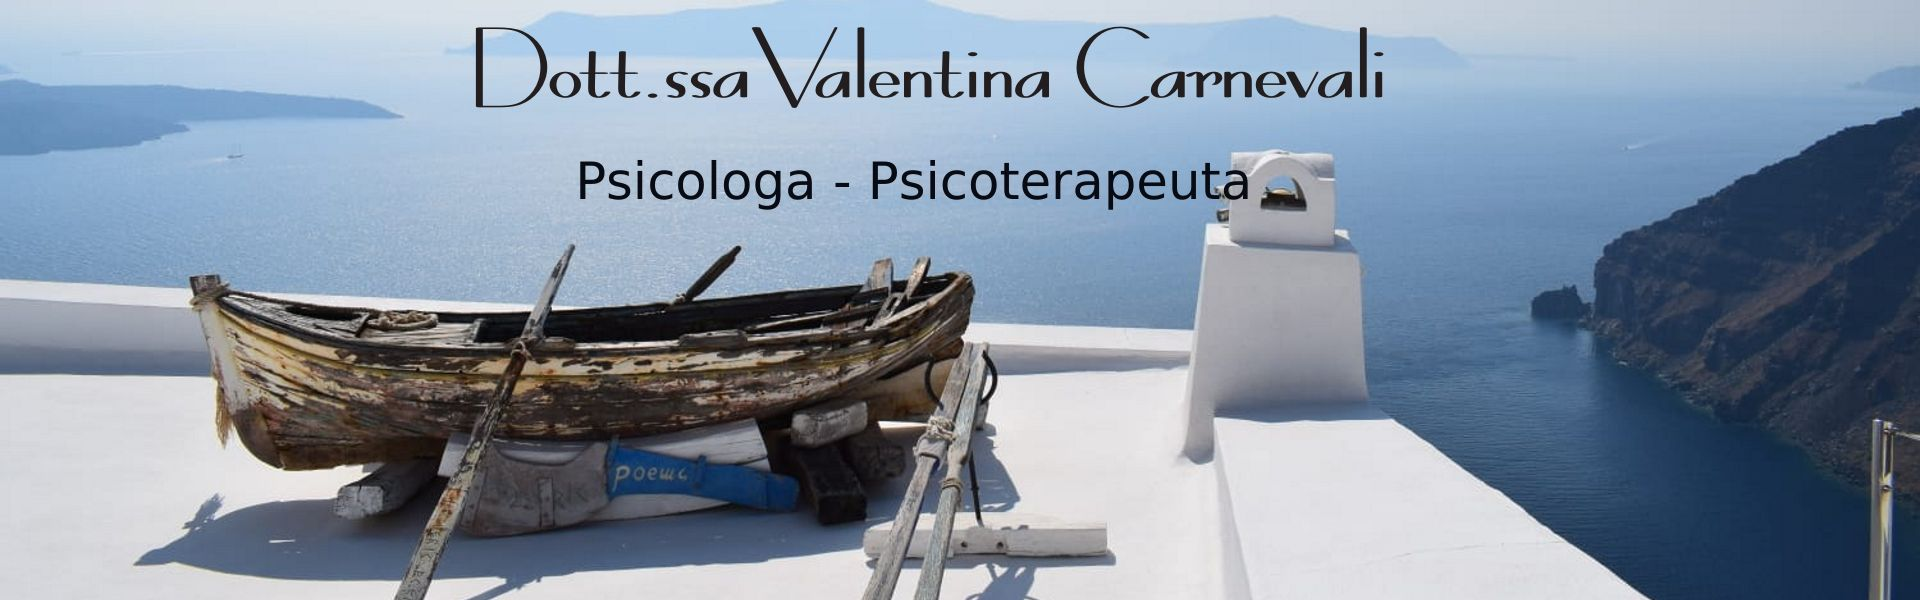 Dott.ssa Valentina Carnevali